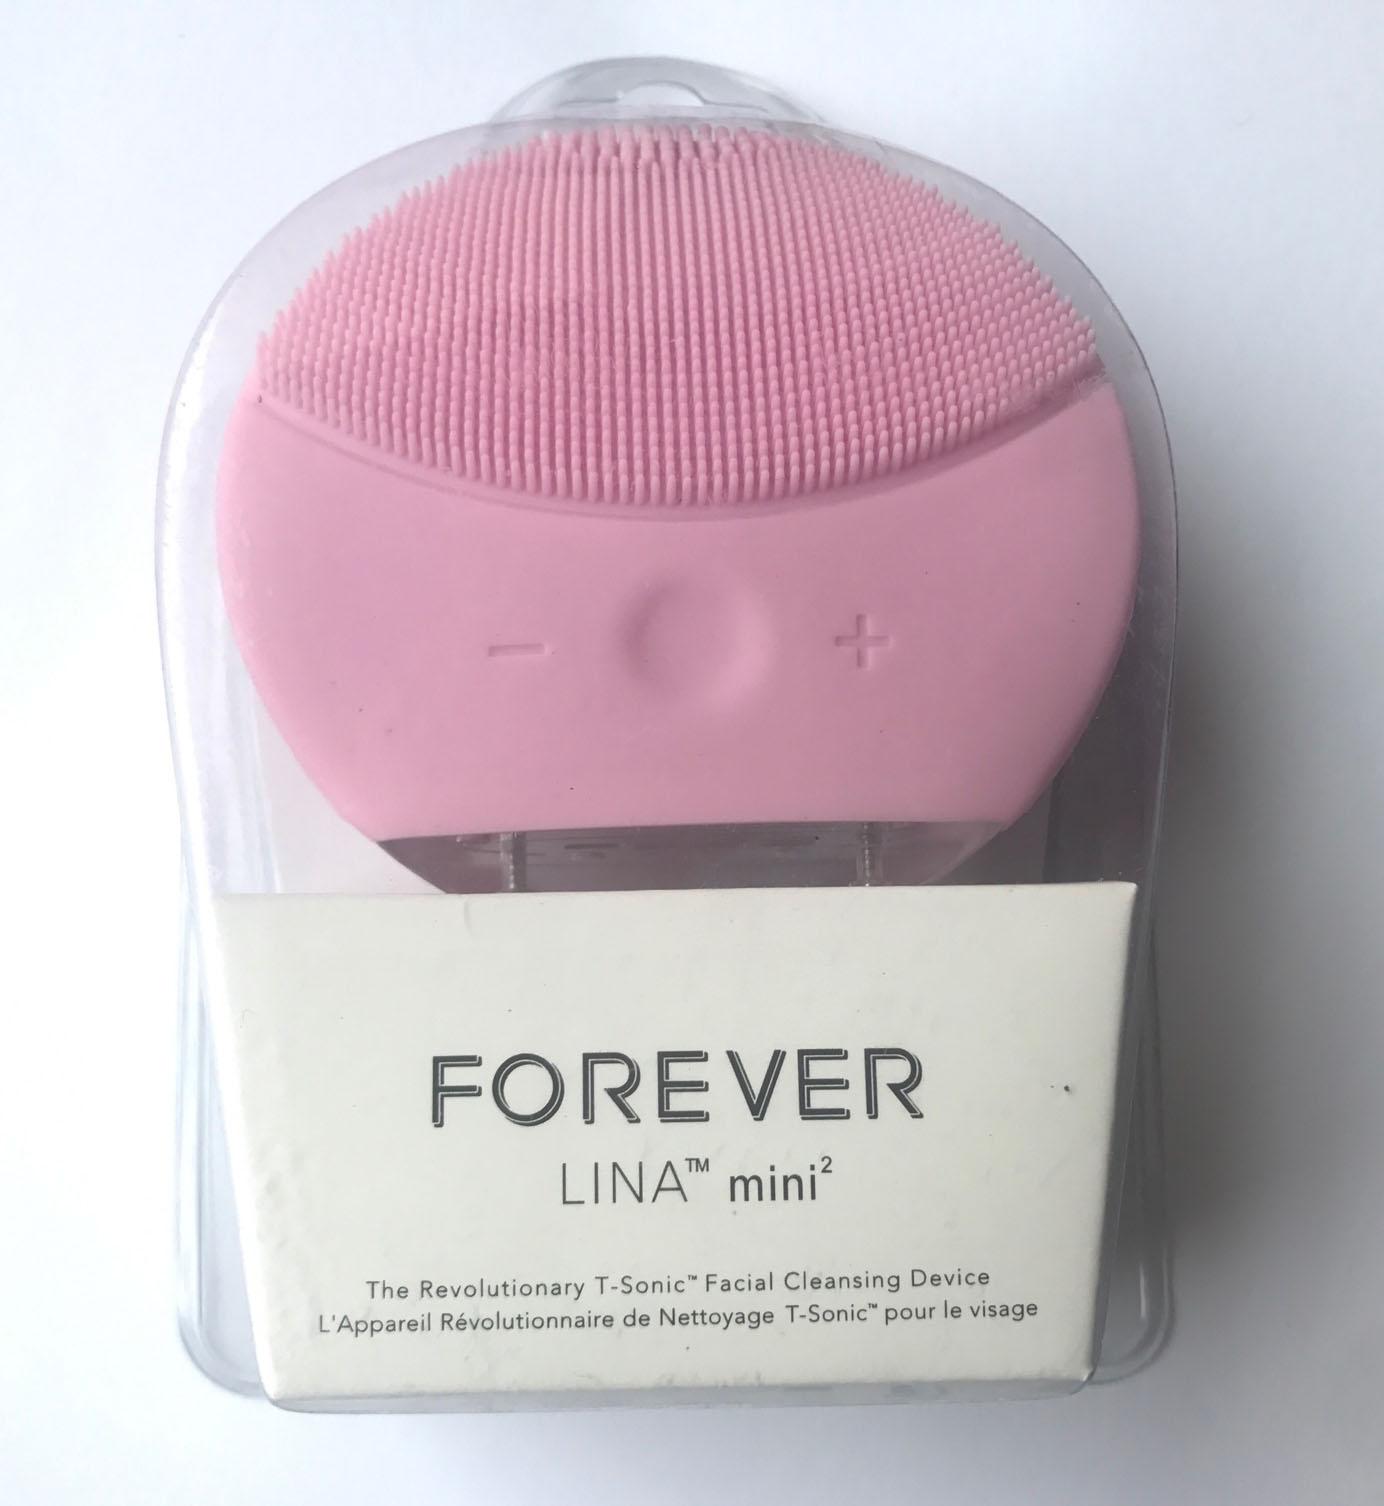 Máy Rửa Mặt Forever Lina mini